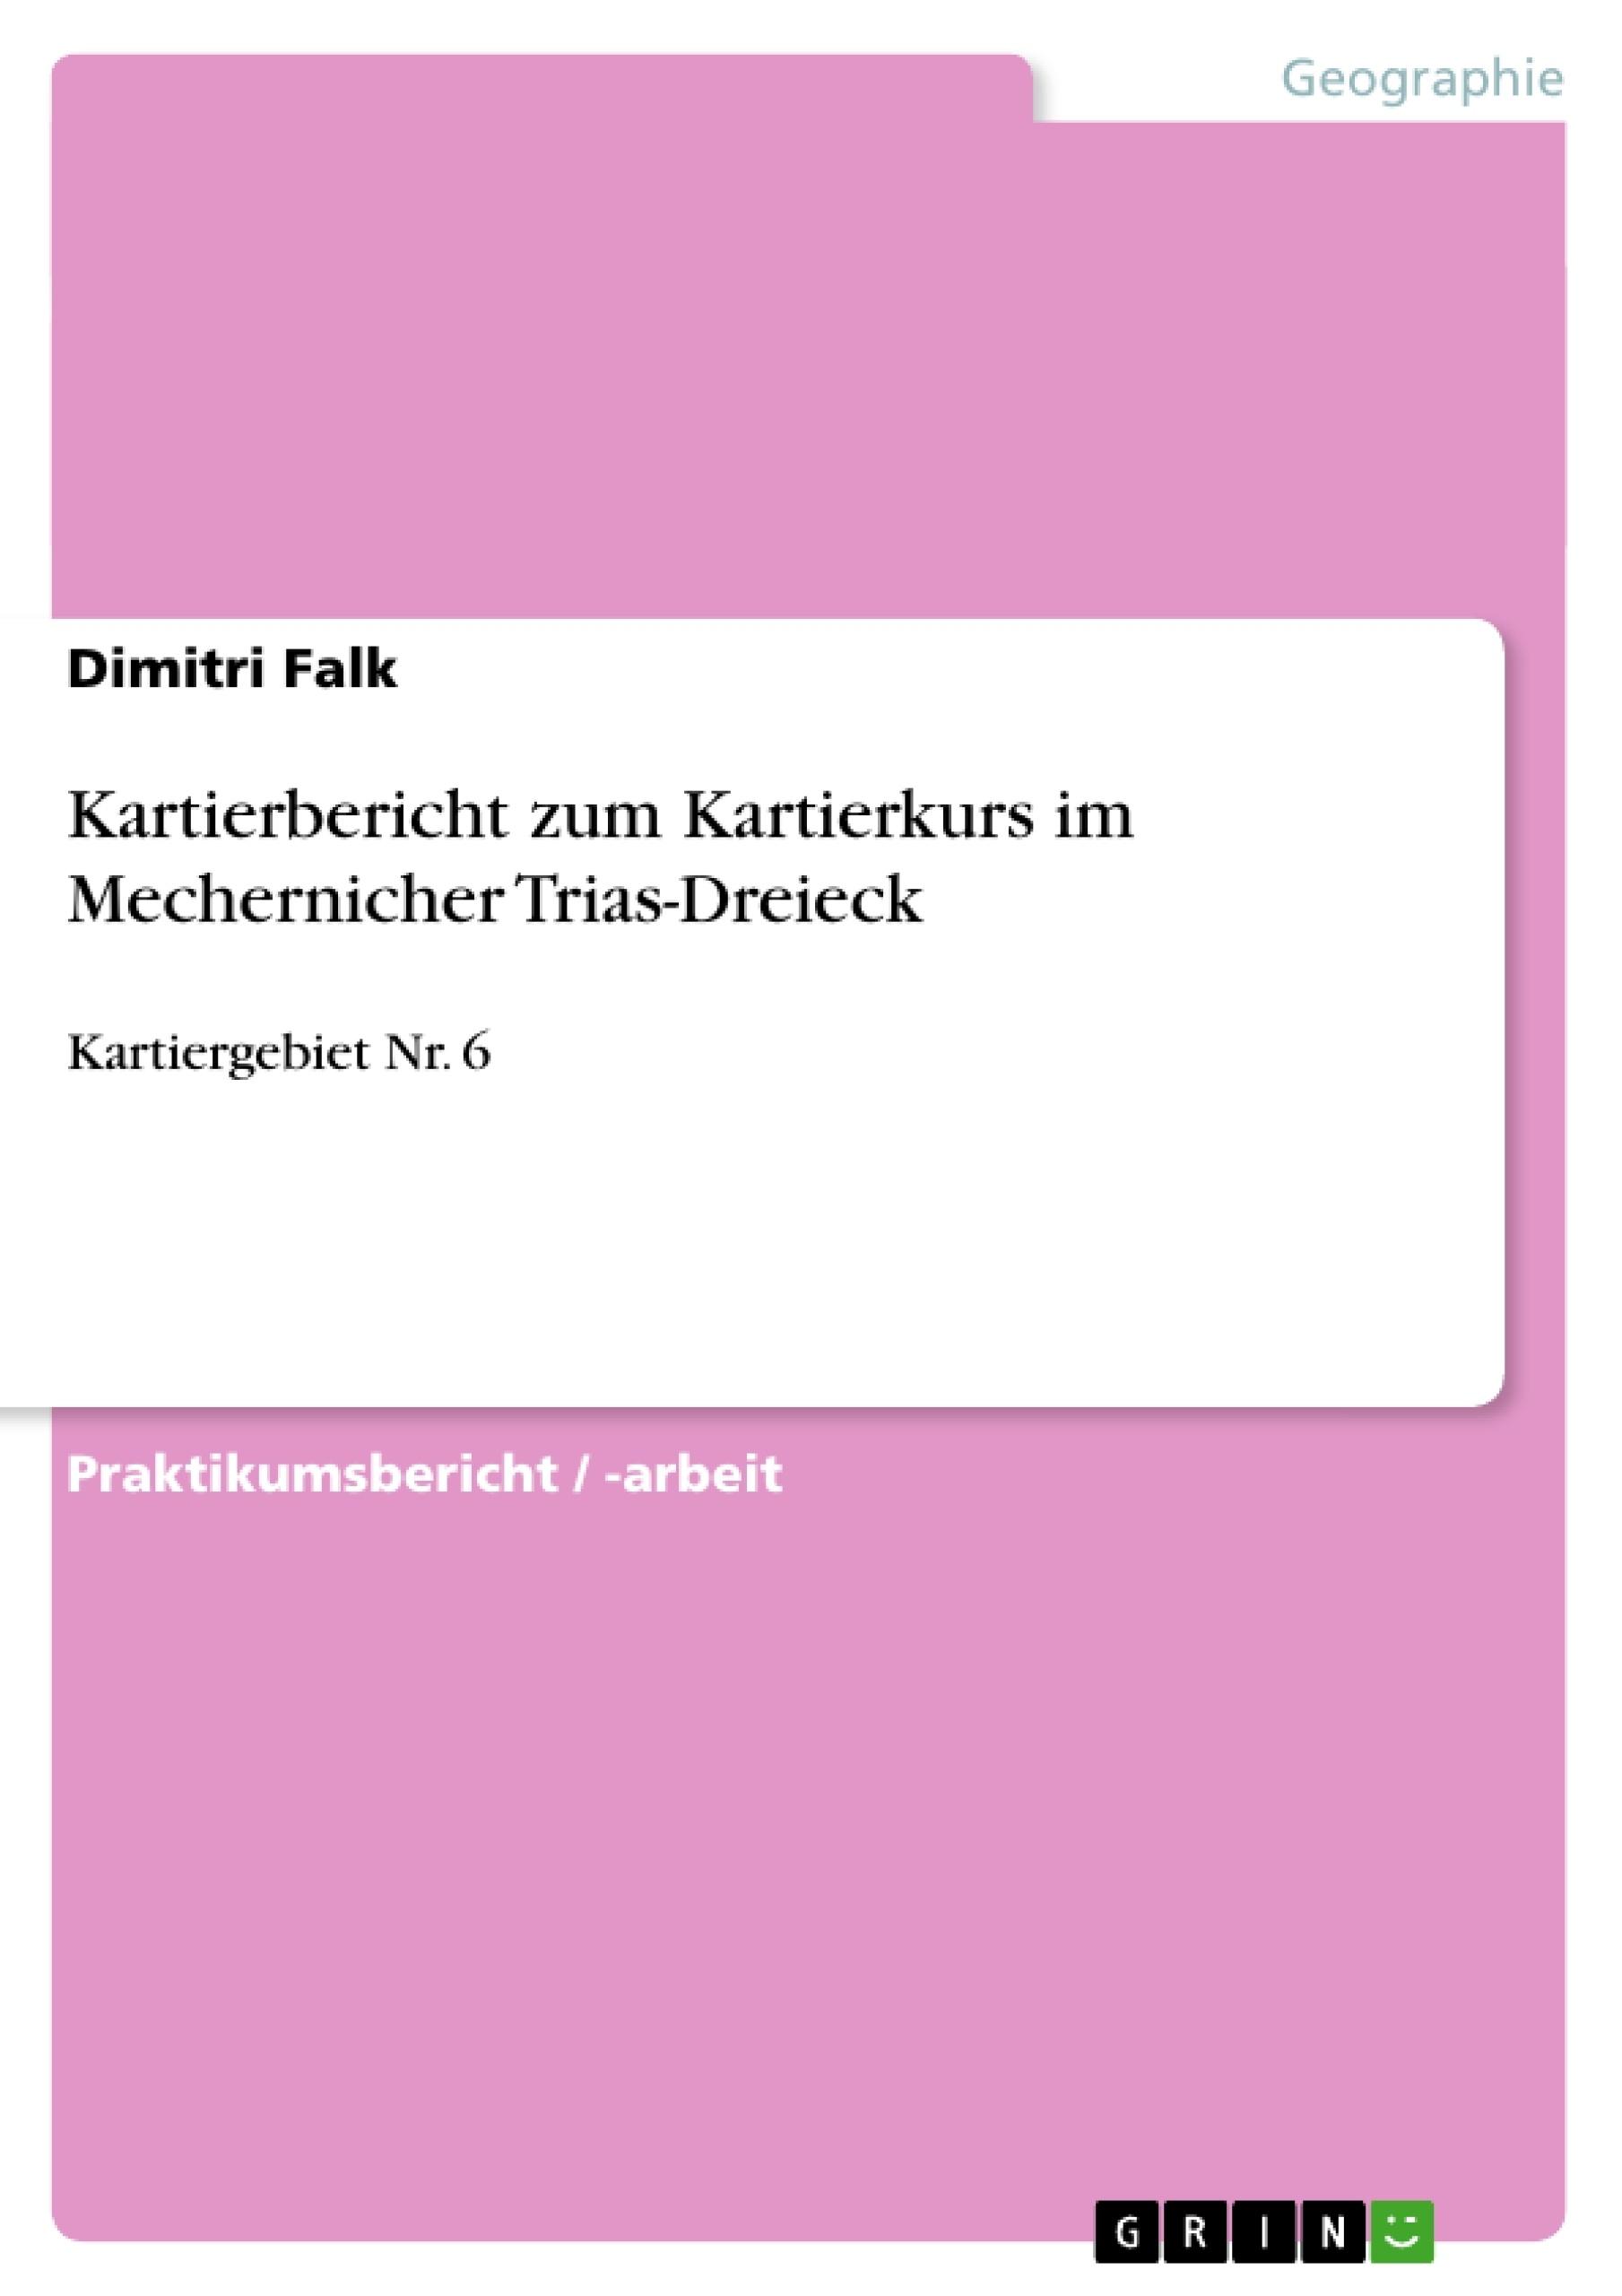 Titel: Kartierbericht zum Kartierkurs im Mechernicher Trias-Dreieck